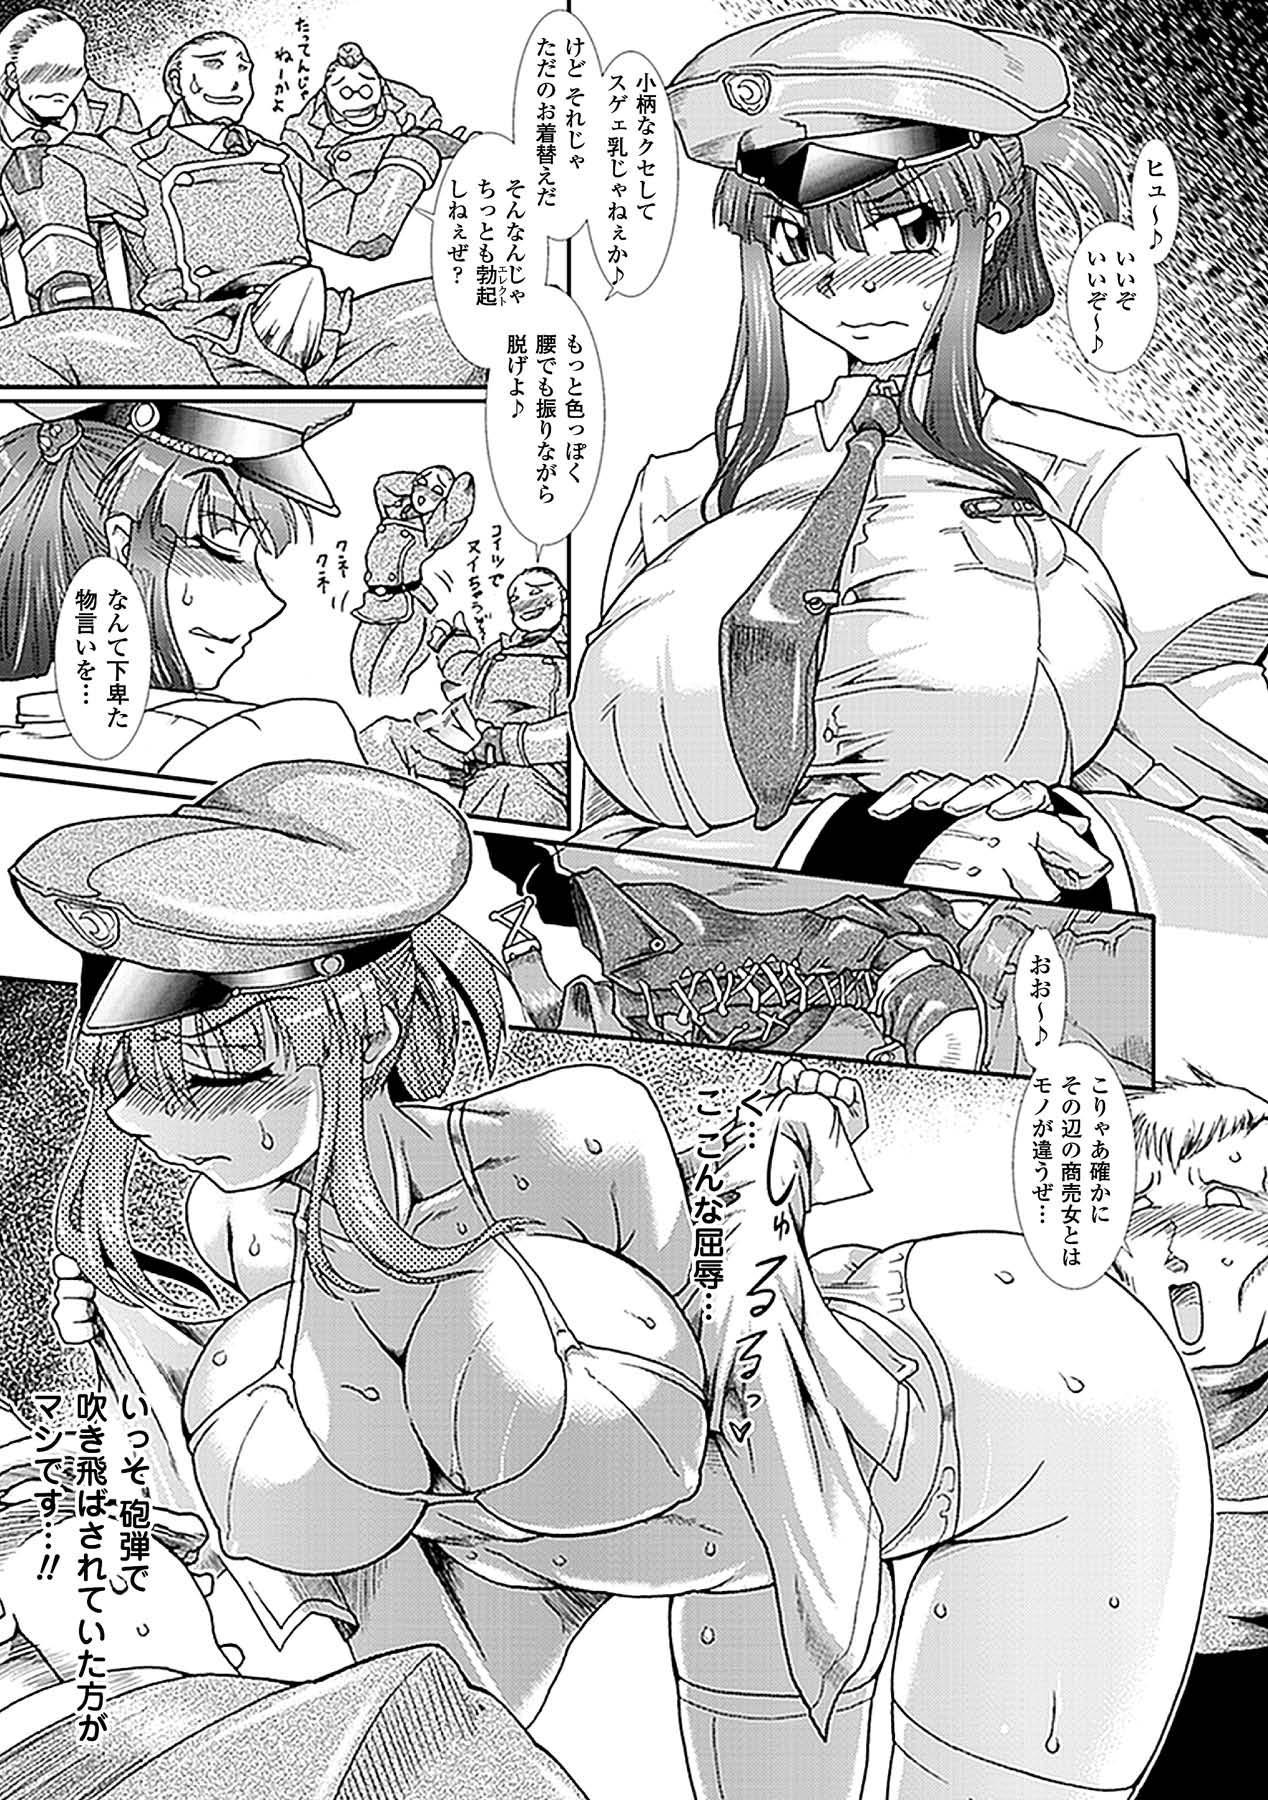 Kyousei Roshutsu Vol.1 Digital 48